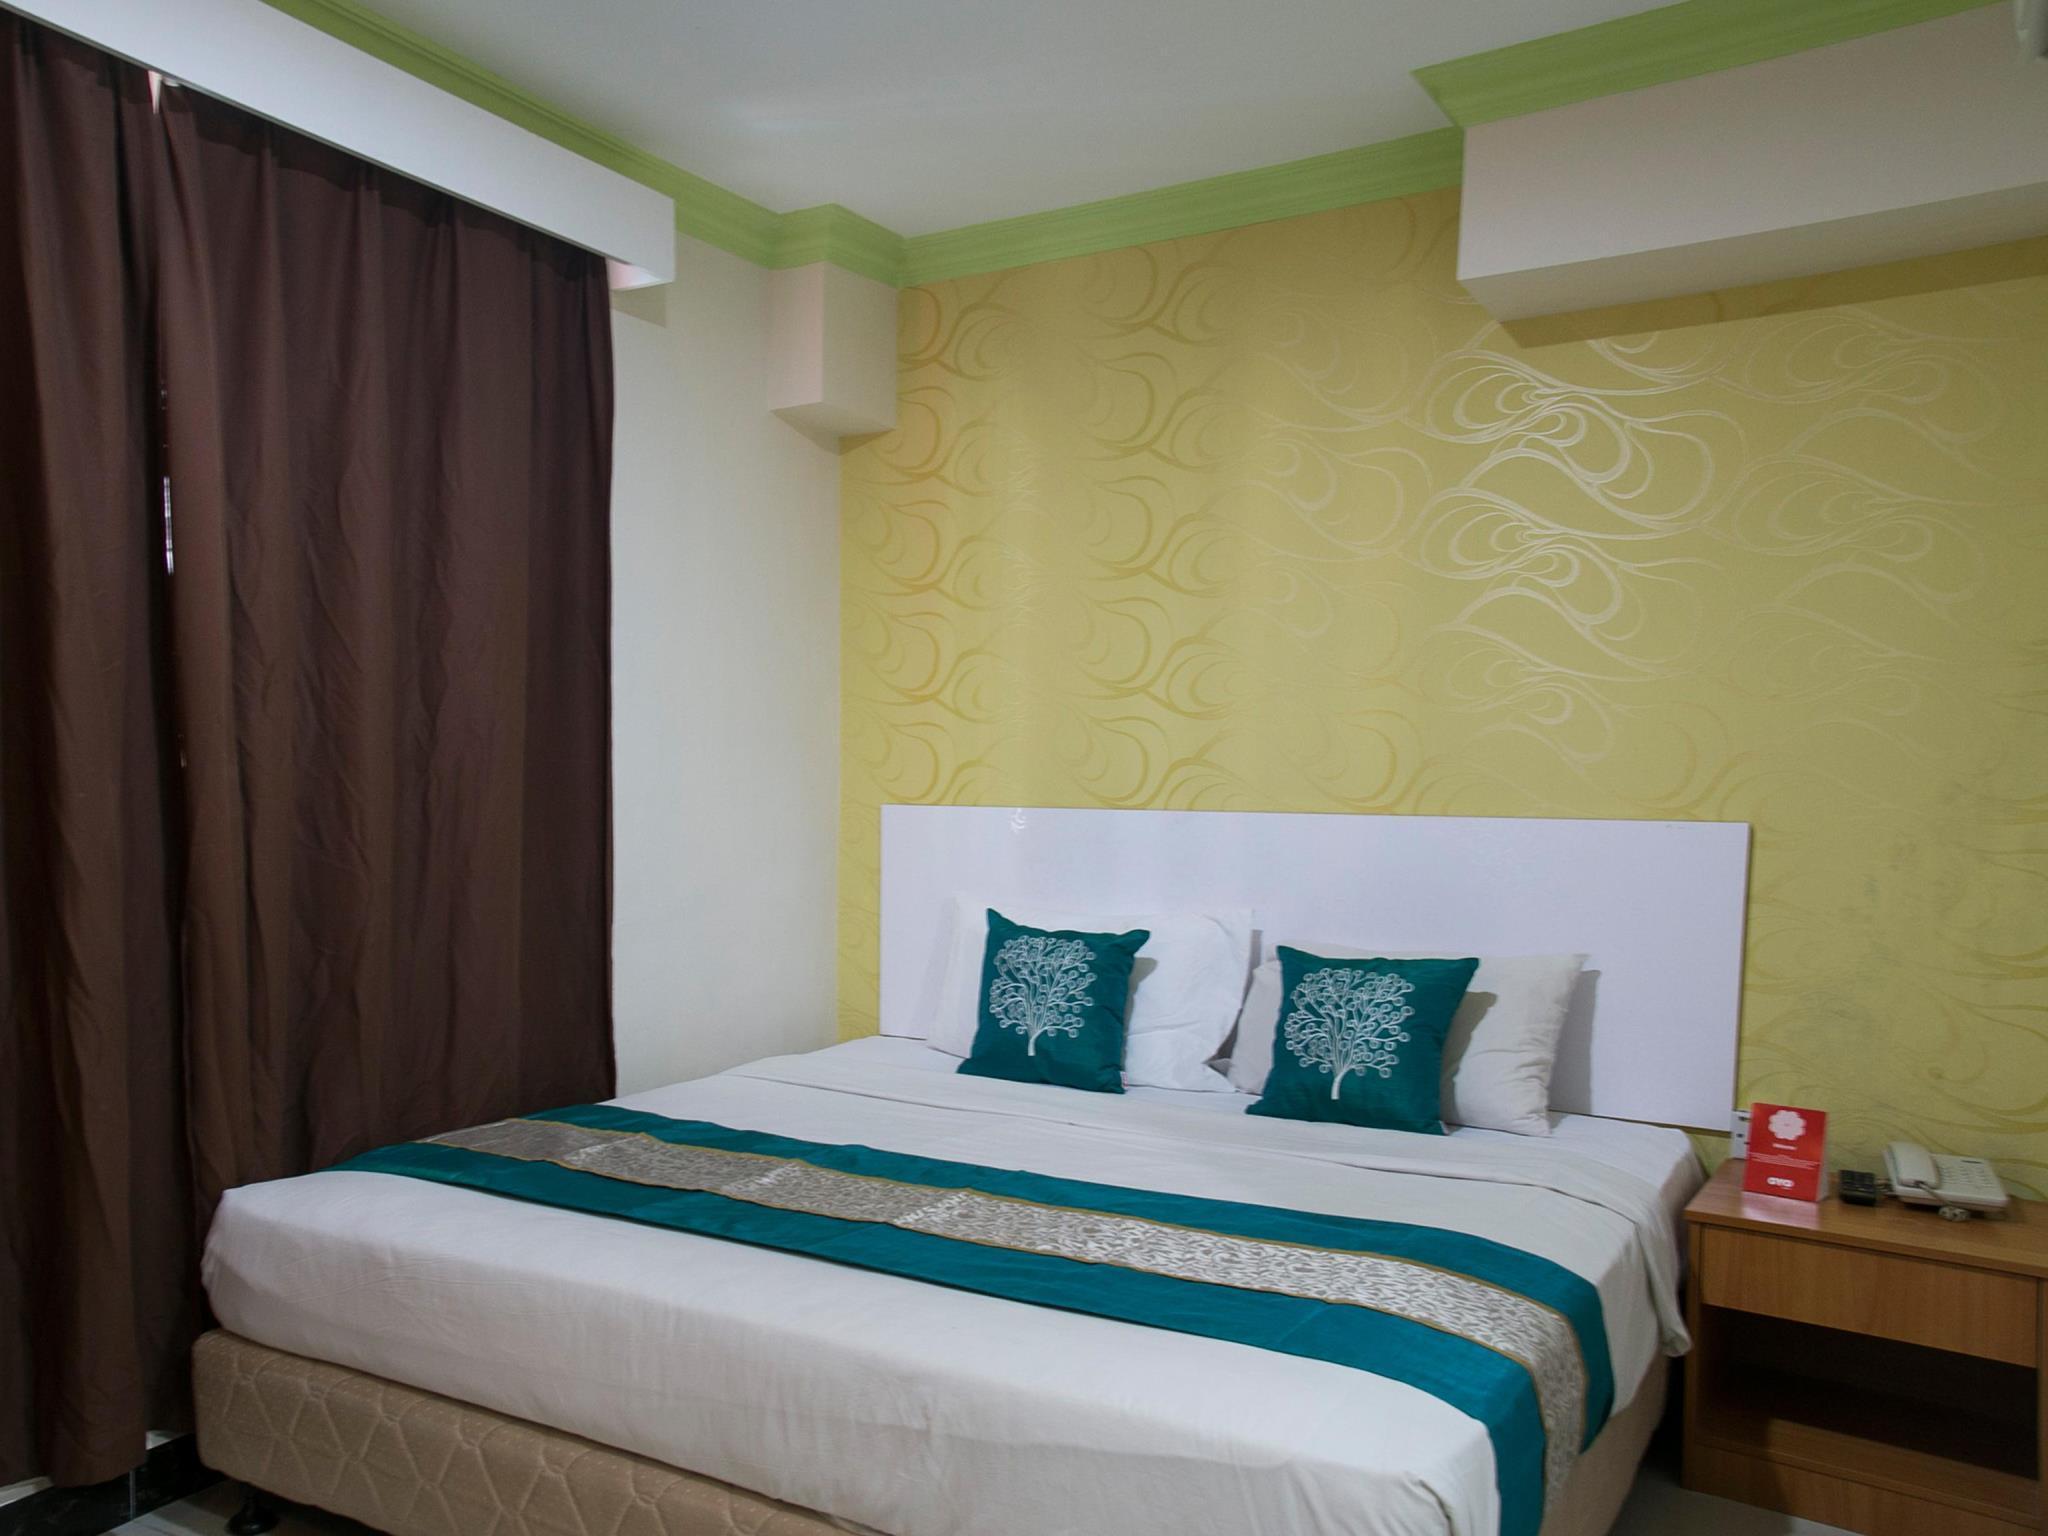 OYO 188 Hotel Bestel, Kuala Lumpur